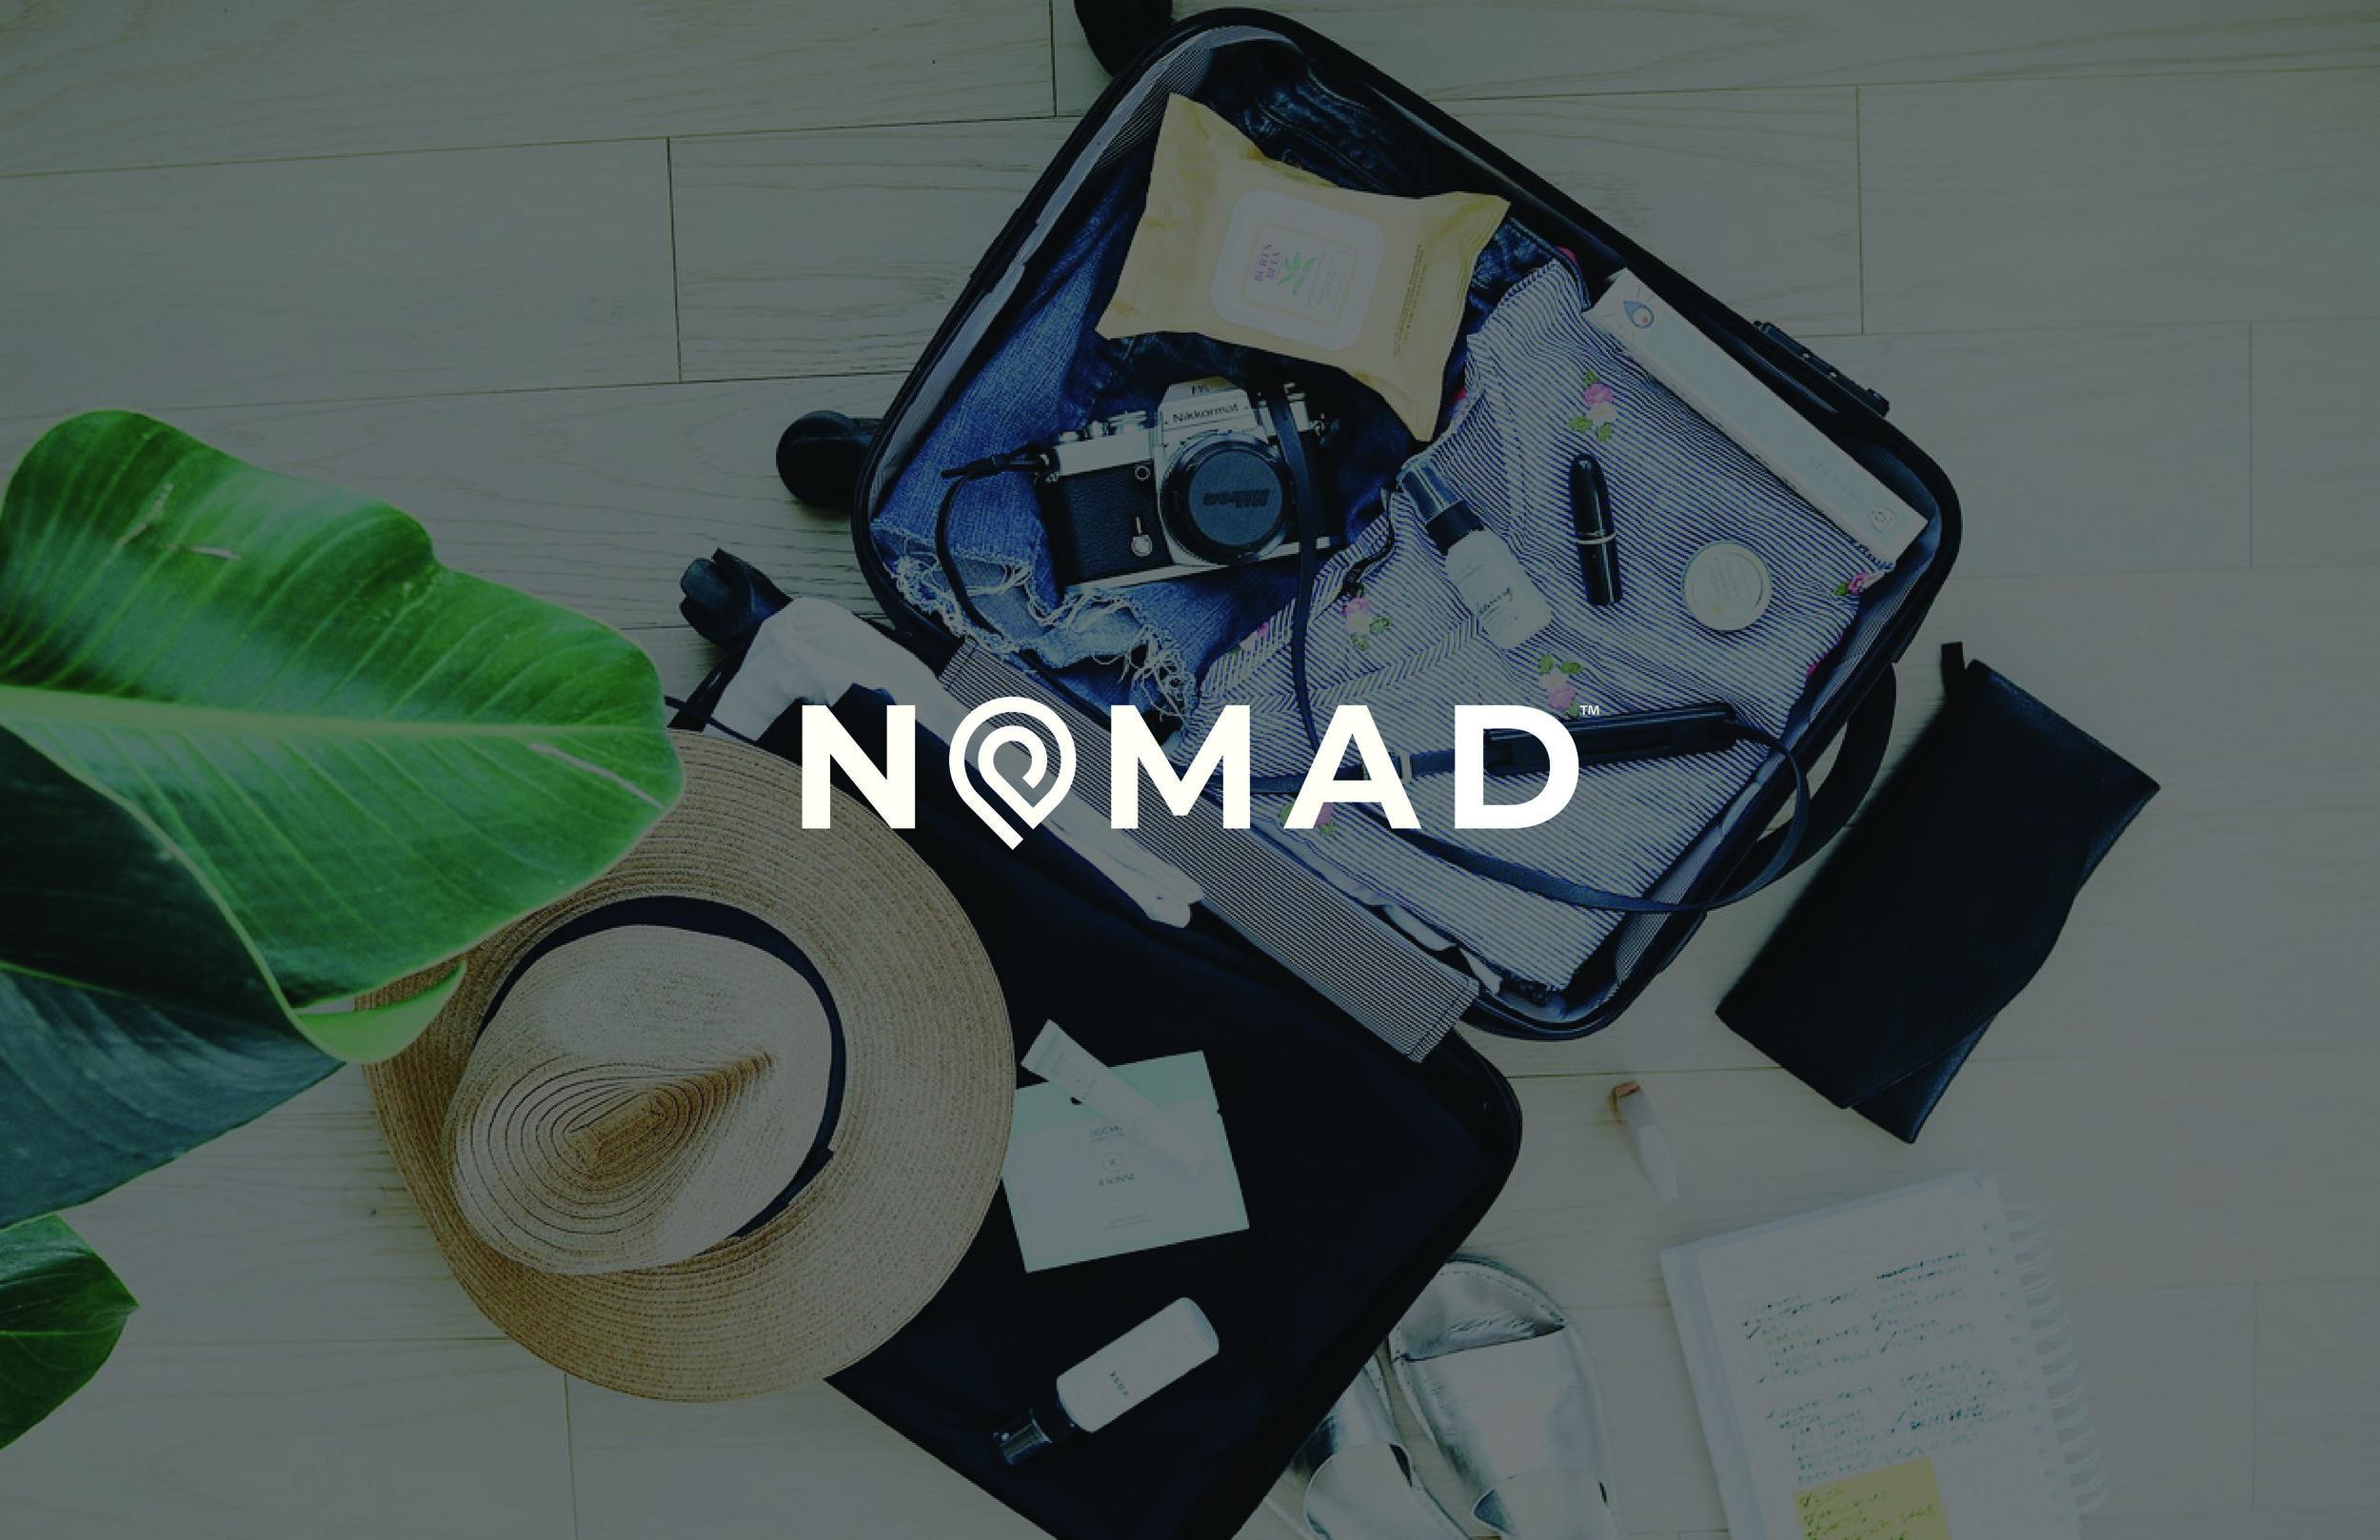 Nomad_Process6.jpg